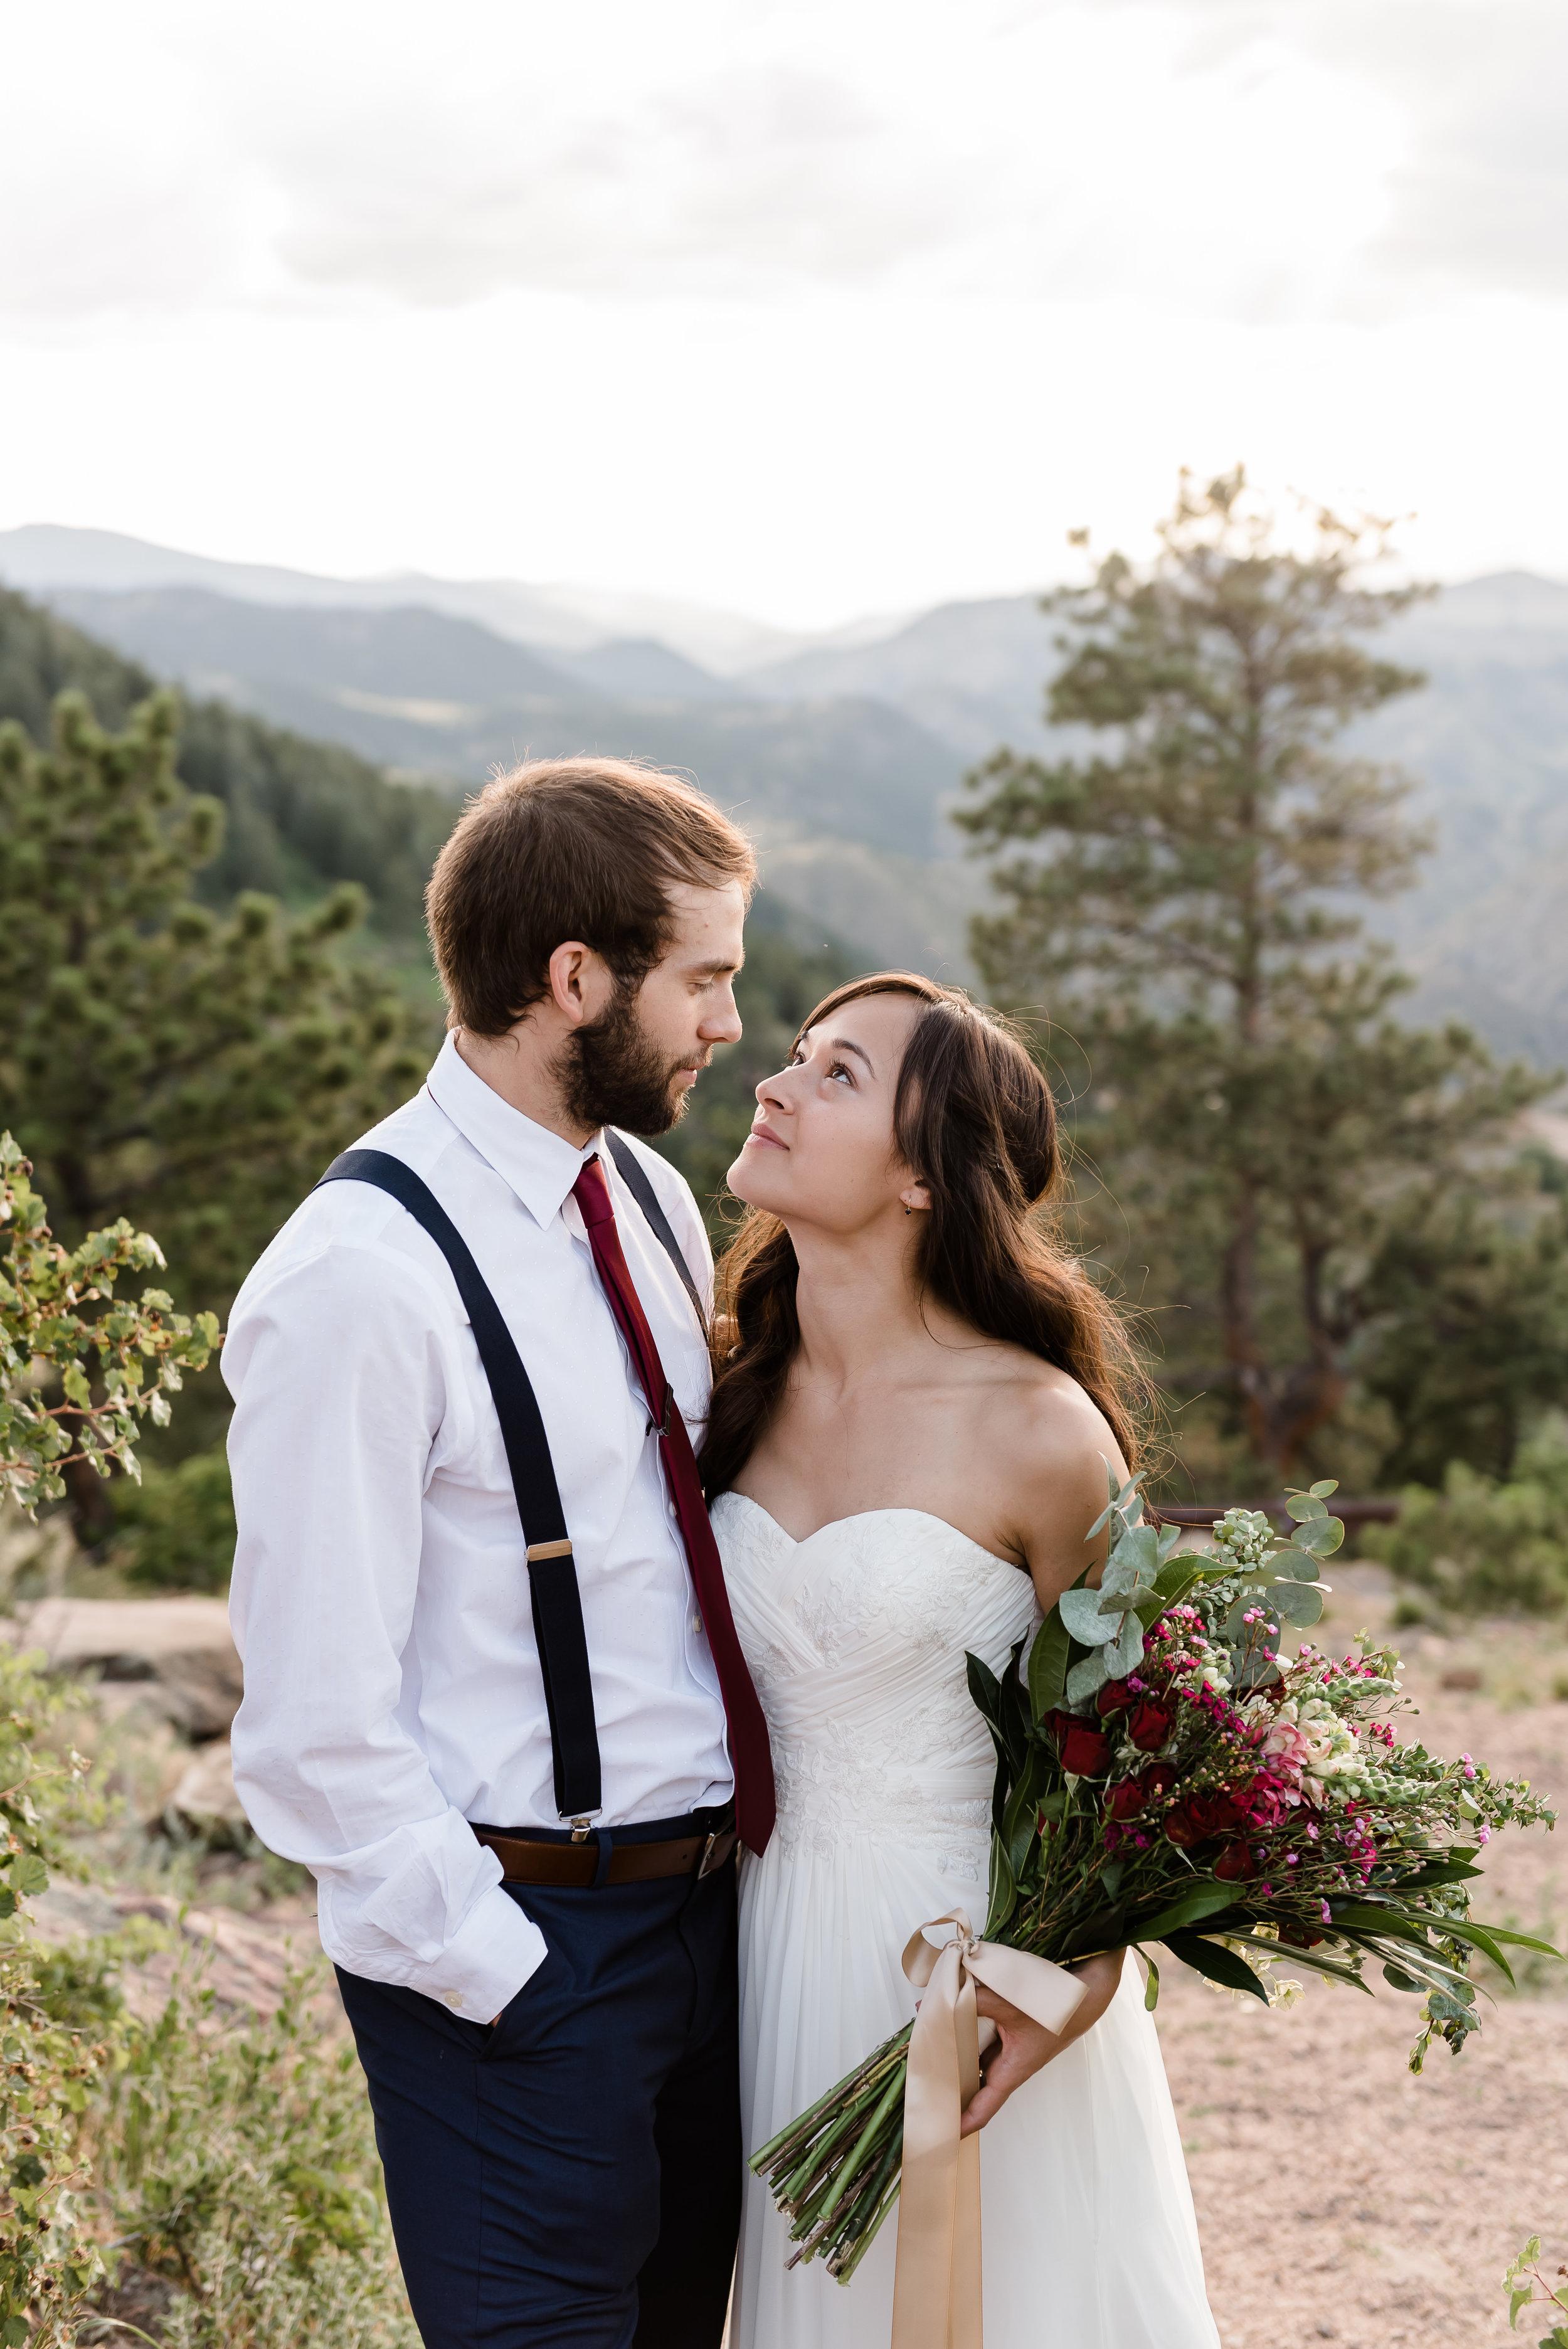 Tashina and Nate - Newlyweds-15.jpg